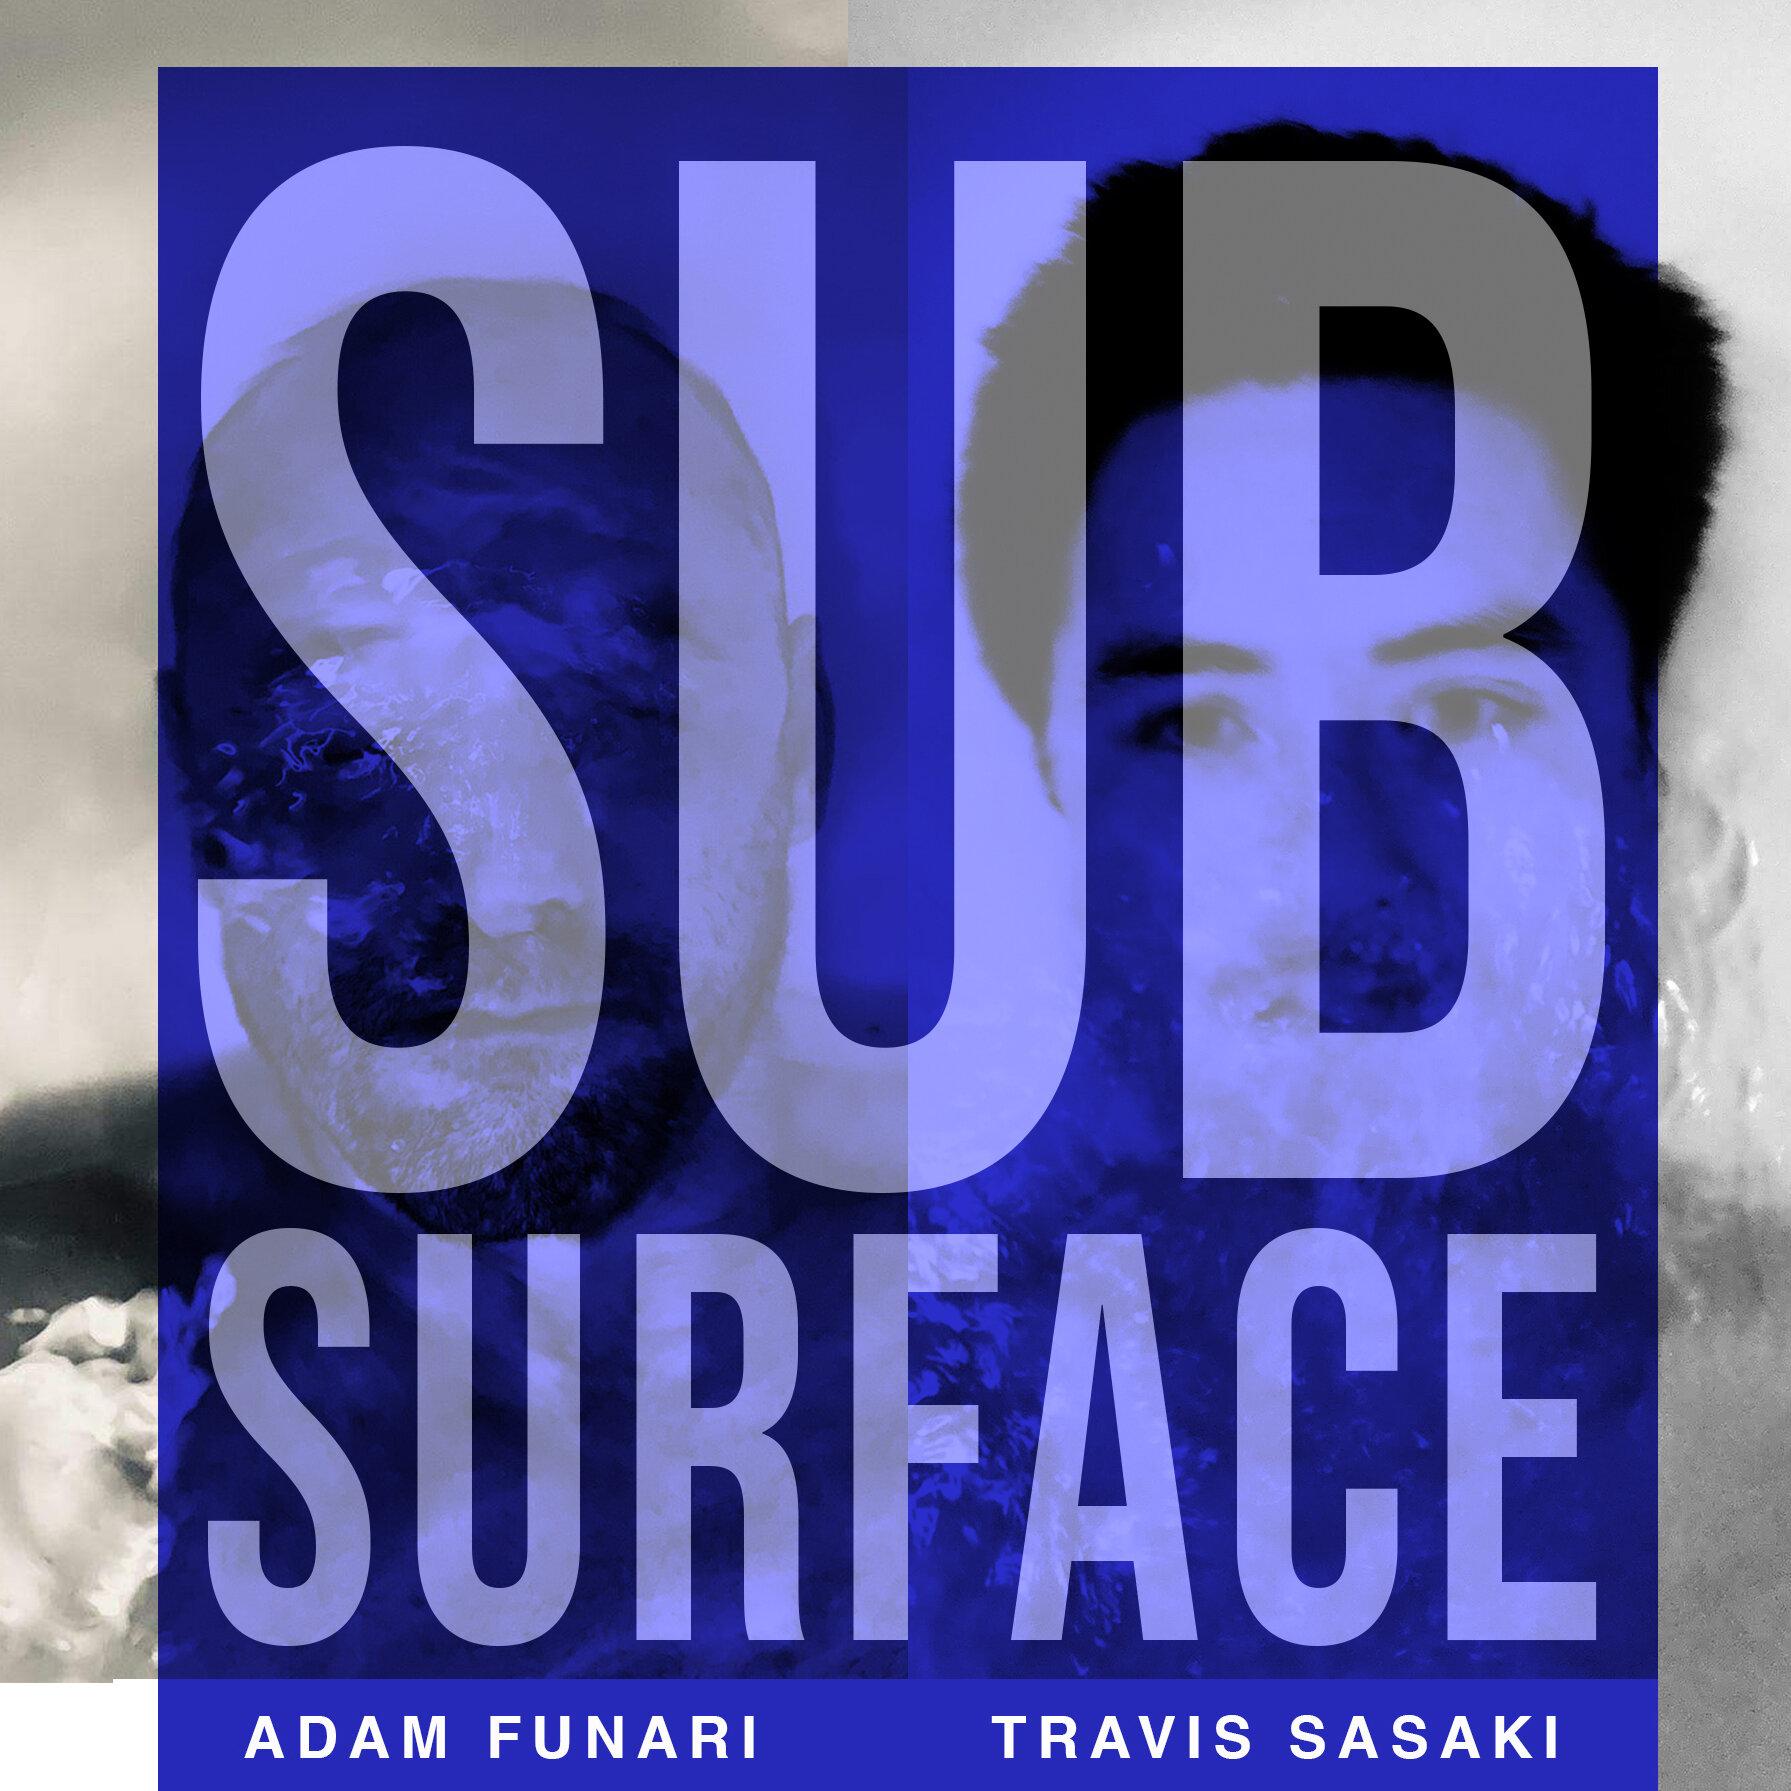 Sub Surface - ADAM FUNARI + TRAVIS SASAKISeptember 7 - 28, 2019